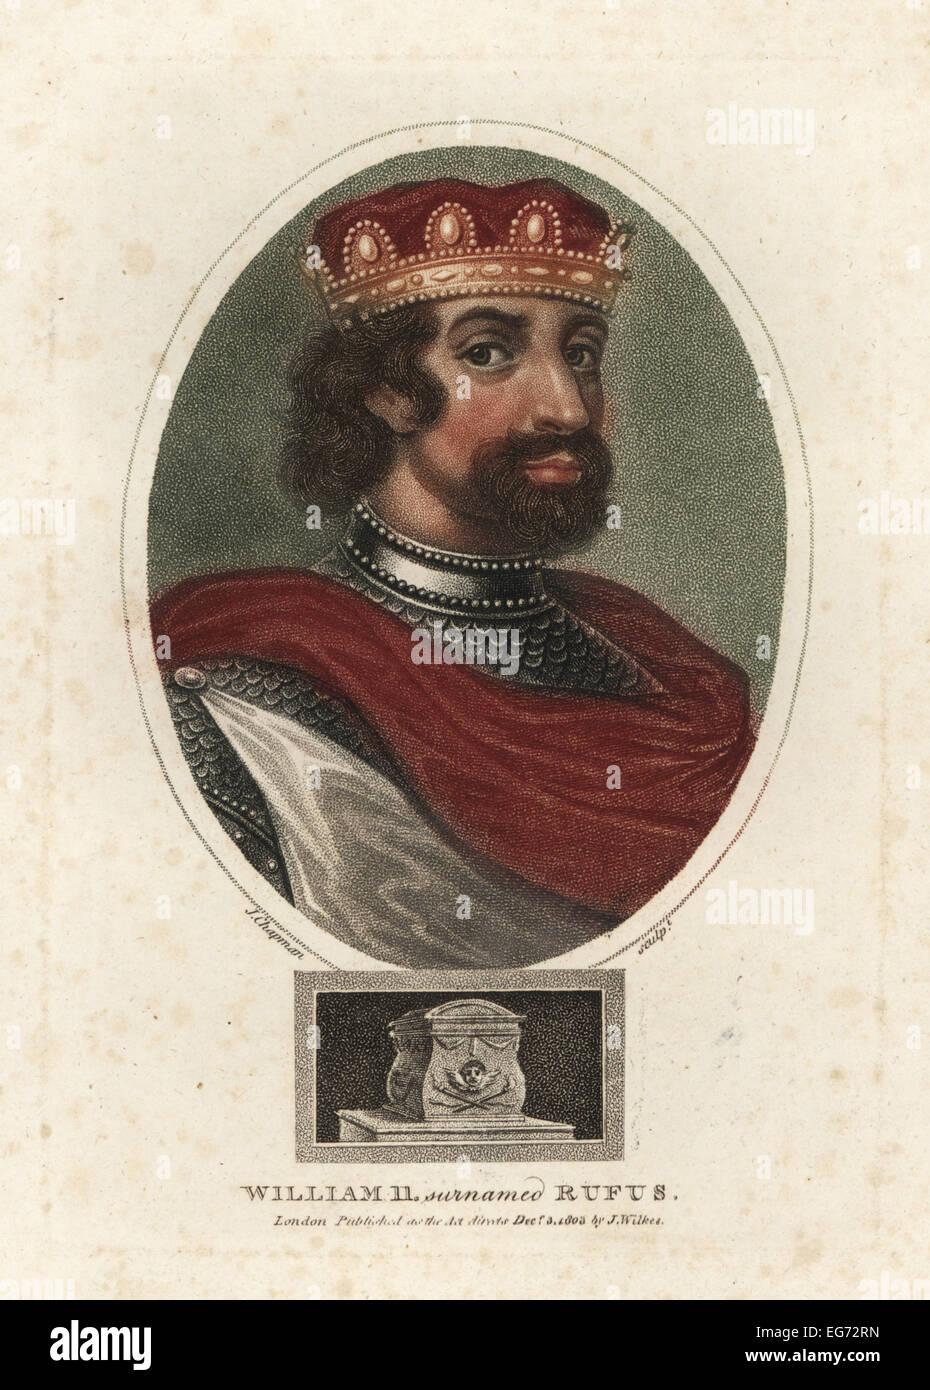 Portrait of William II or William Rufus, (c1056-1100), King of England. - Stock Image